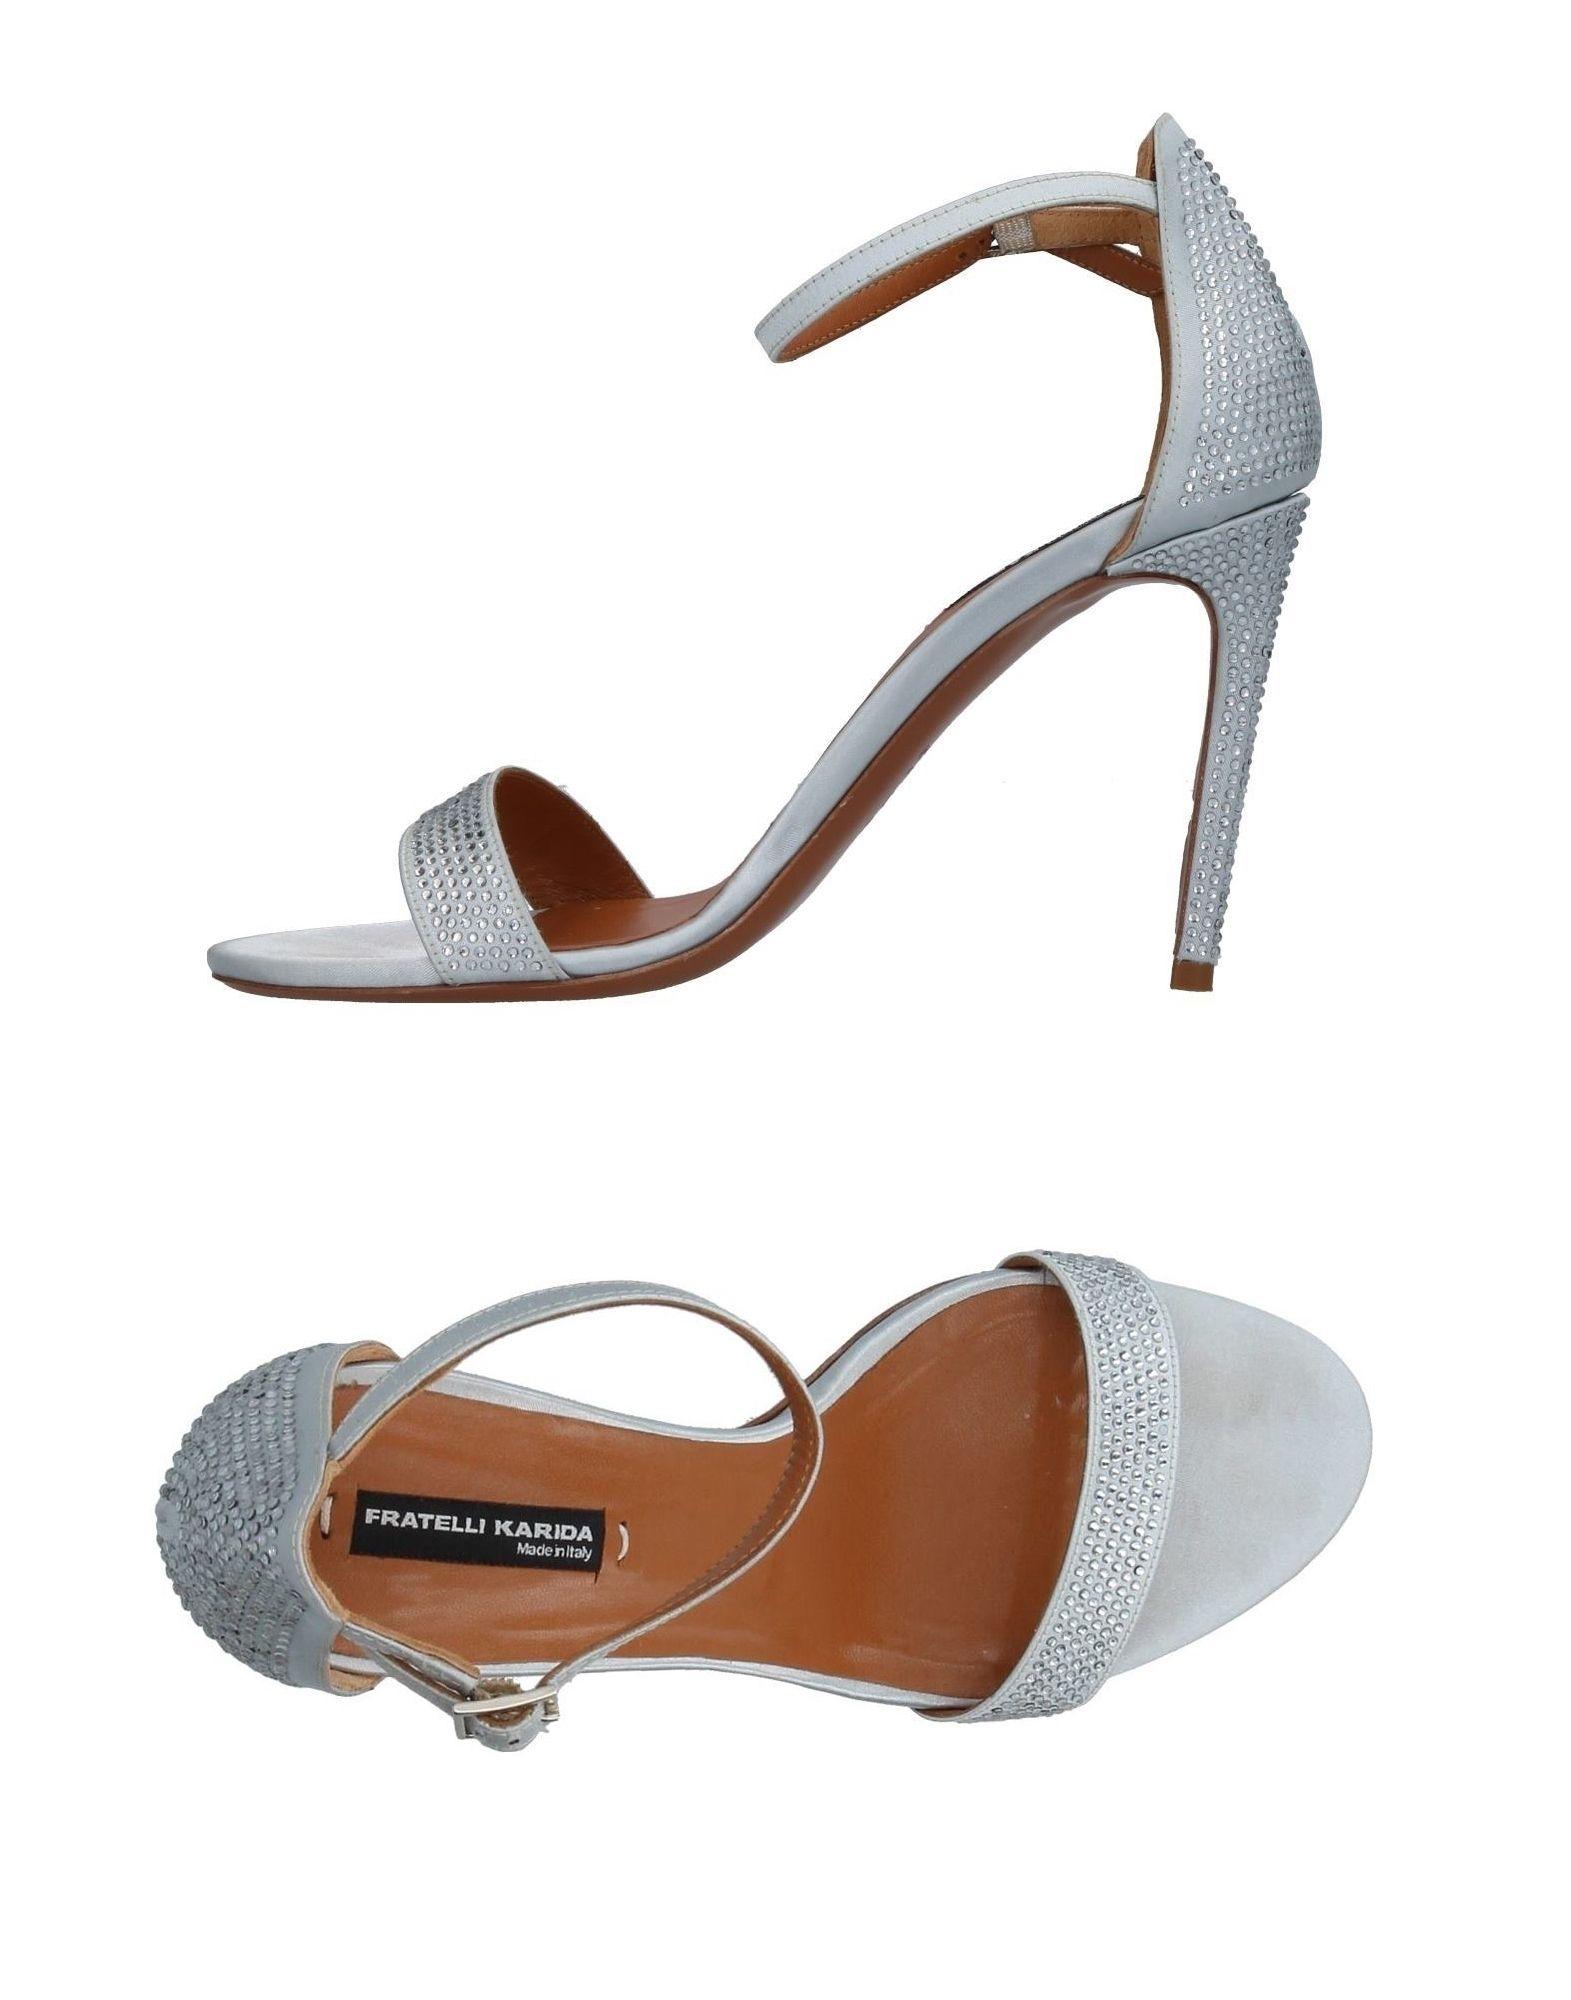 Fratelli Karida Sandalen Damen  11399750FU Gute Qualität beliebte Schuhe